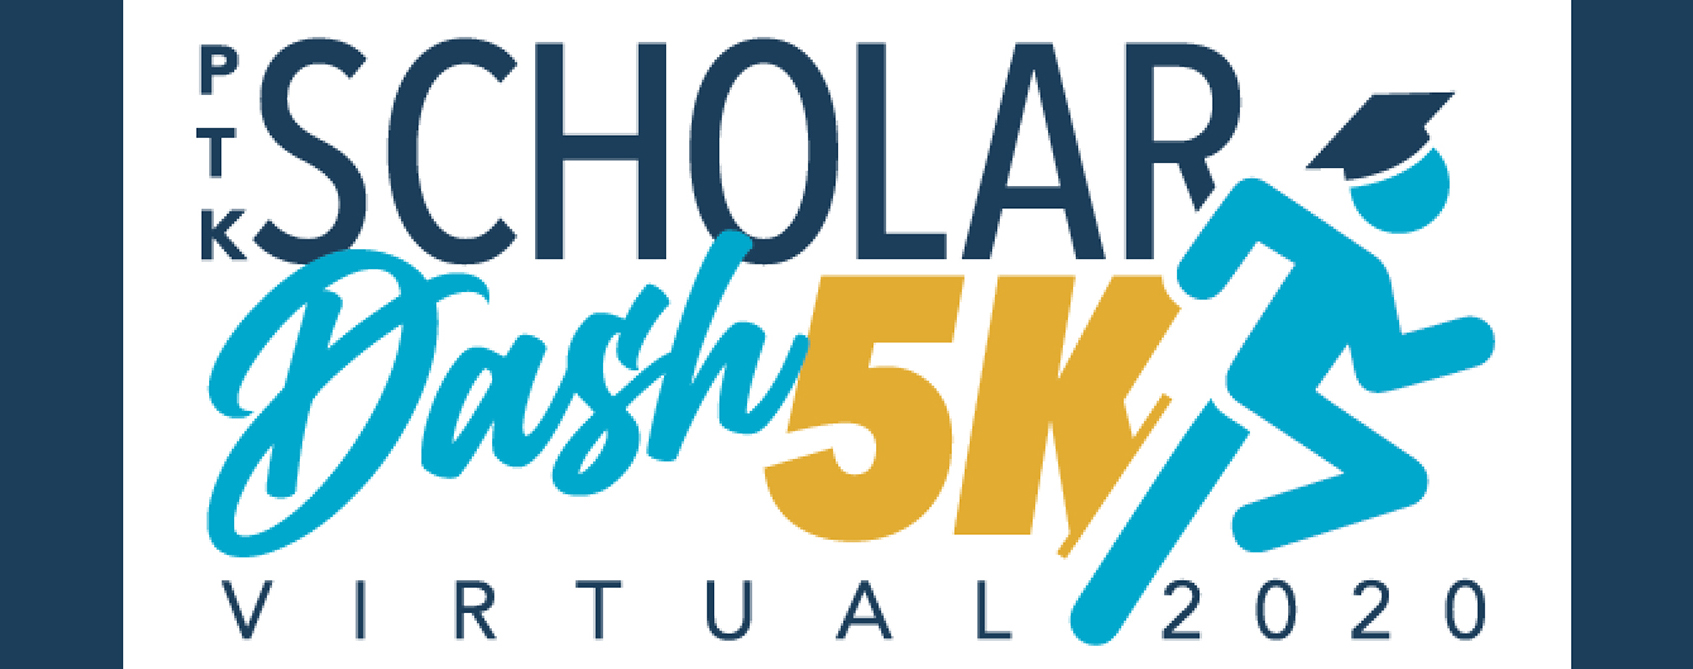 PTK Scholar Dash 5K